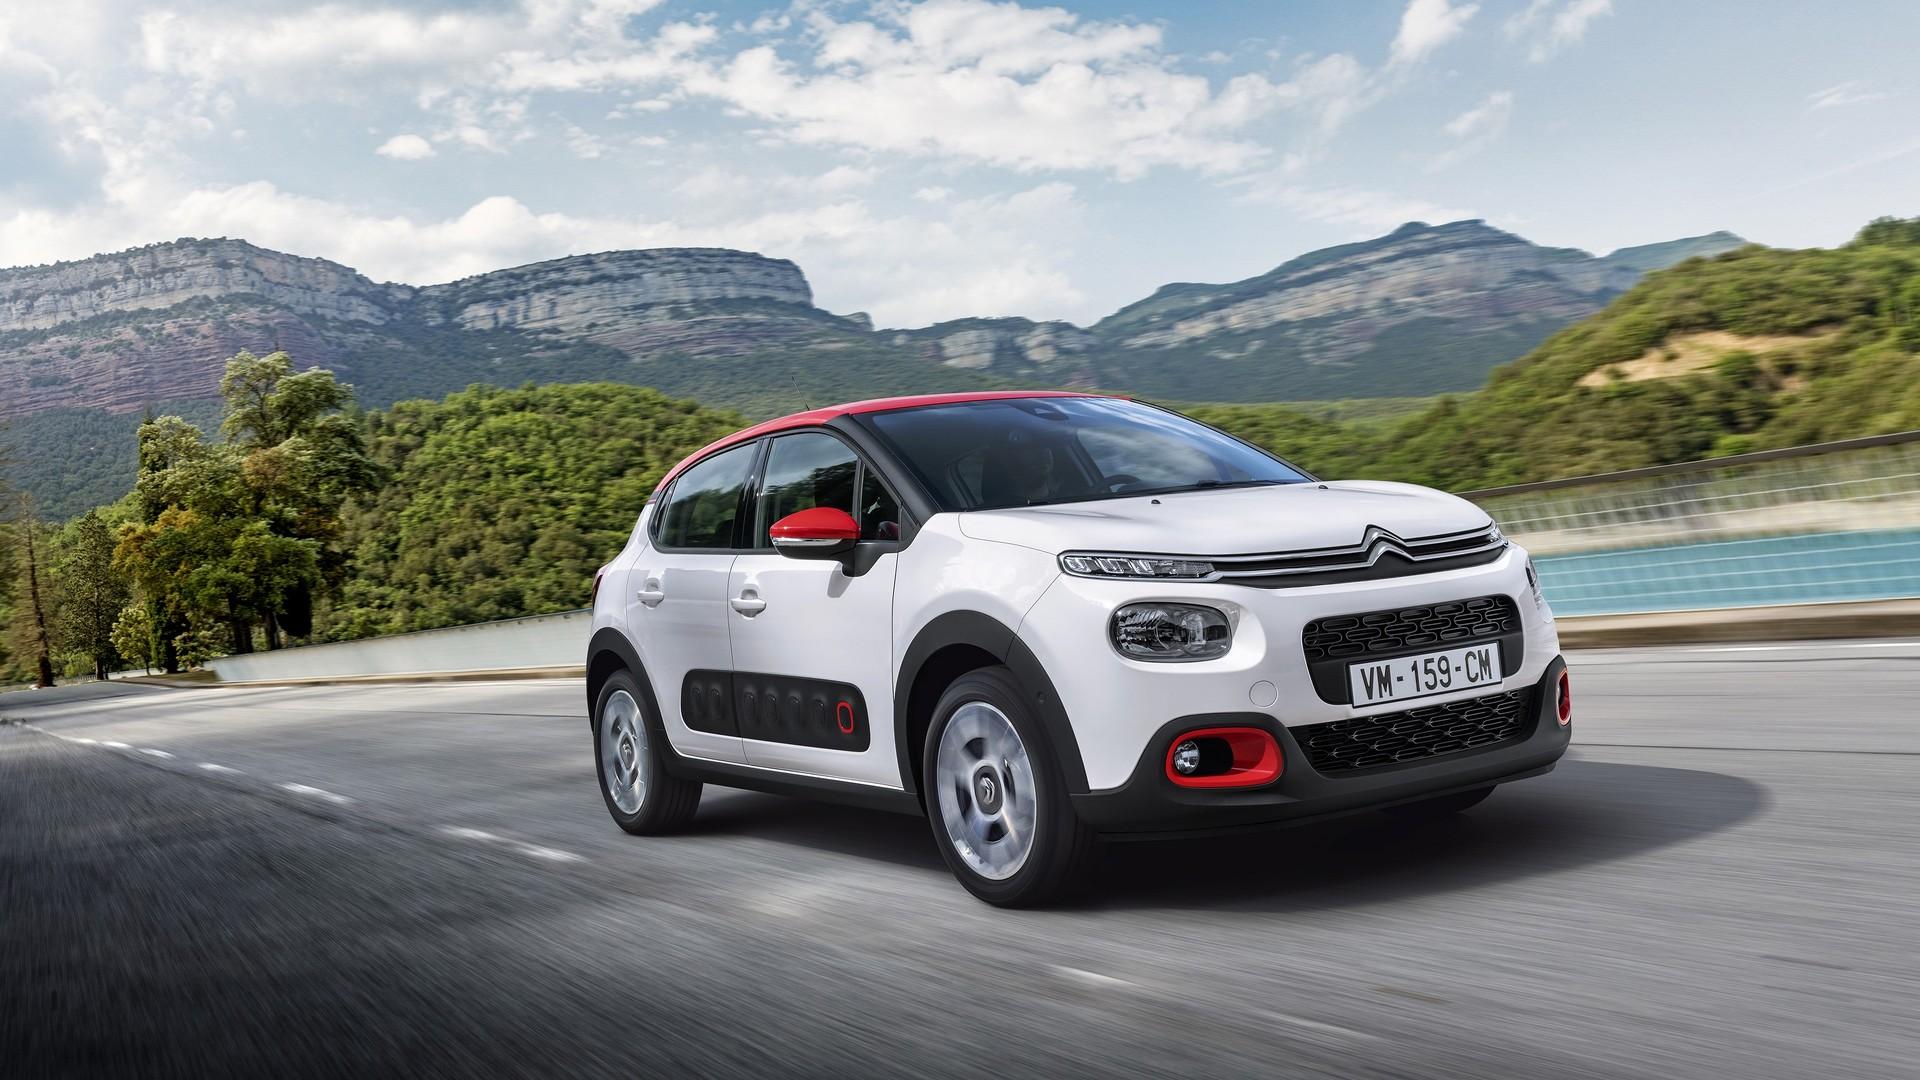 Citroën C3 News and Reviews | Motor1.com UK